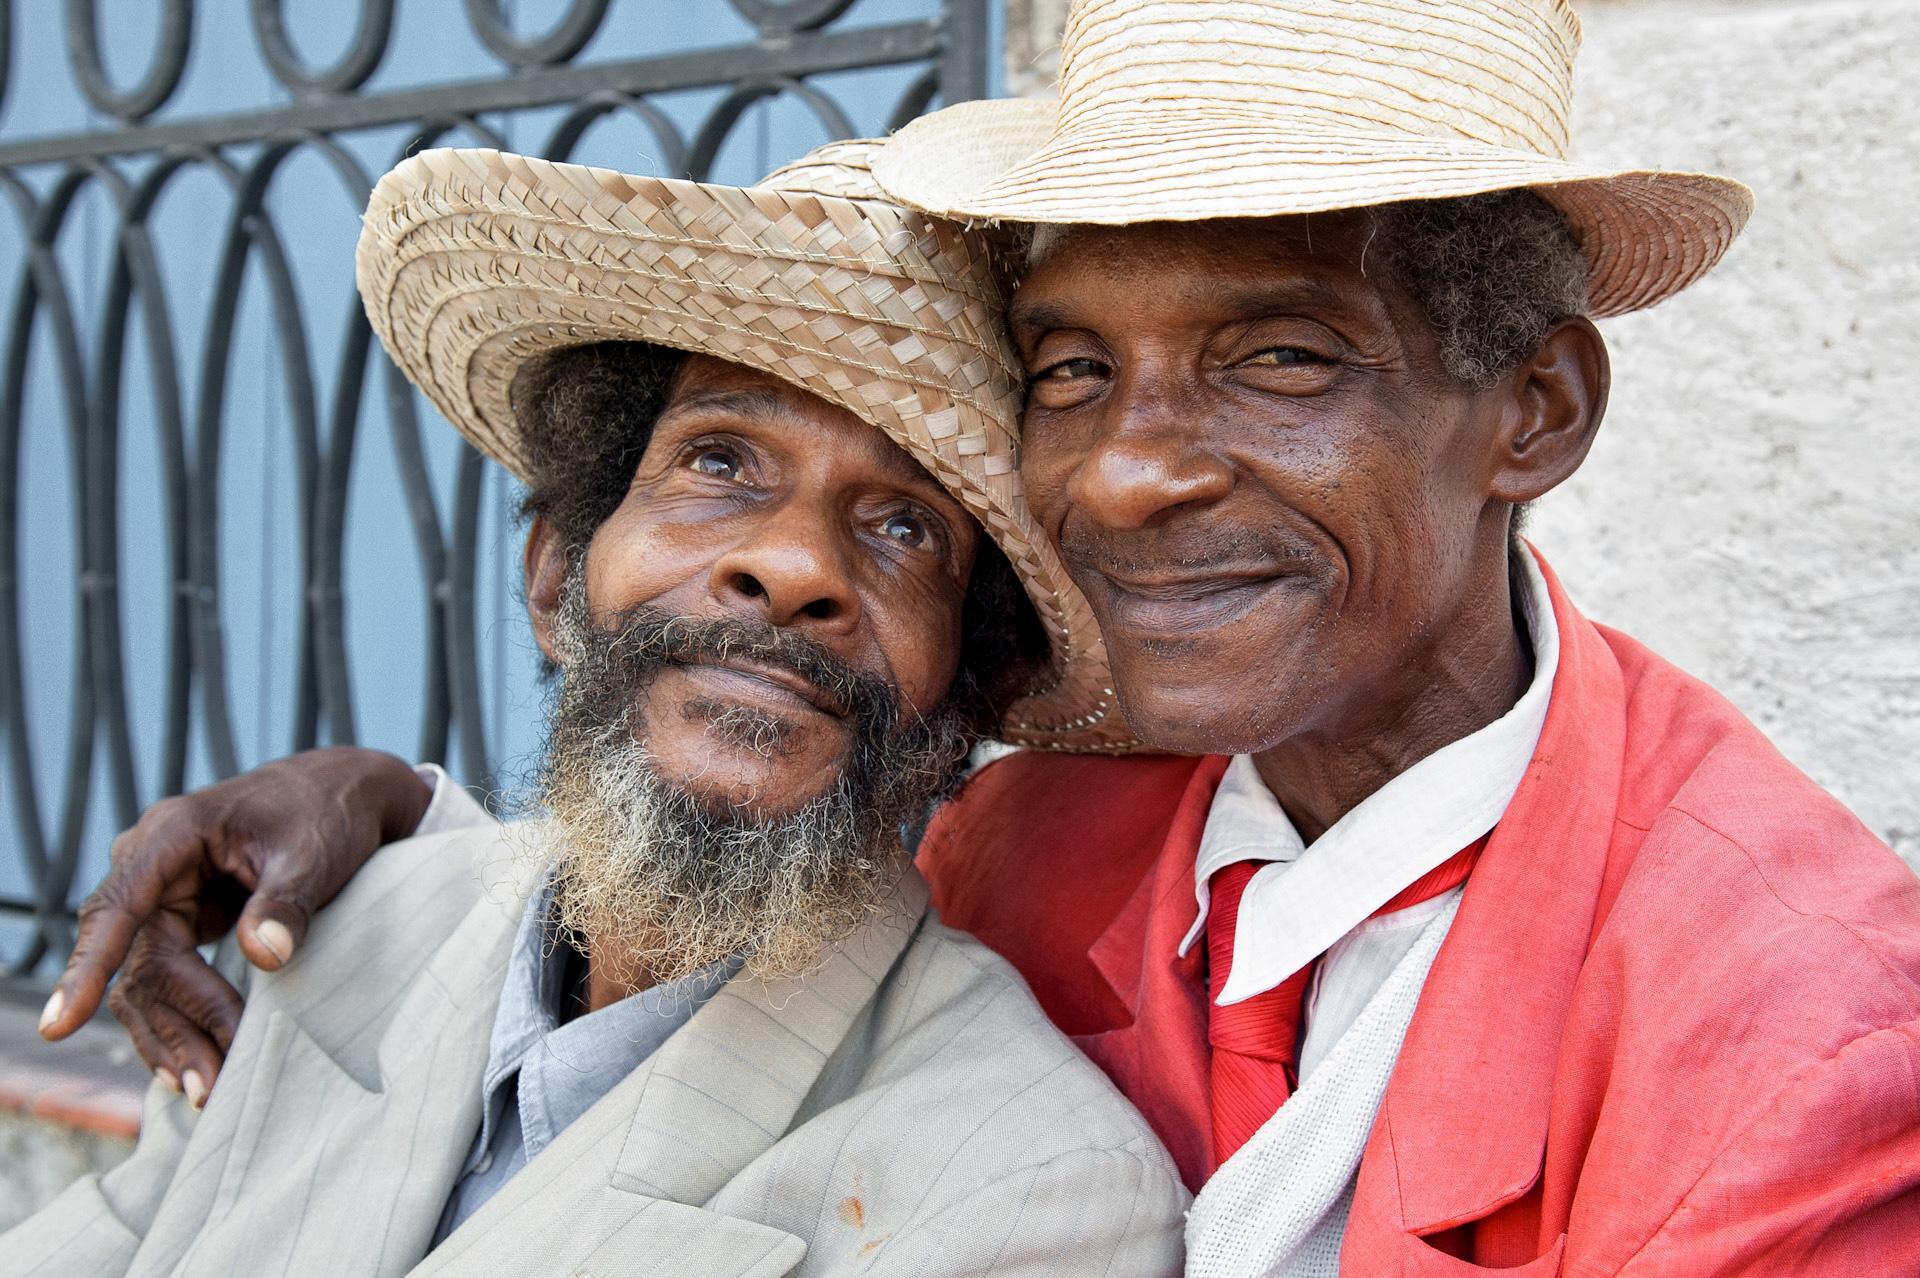 Jason_Bax_SQ_Travel_Cuba_Havana_Portrait.jpg